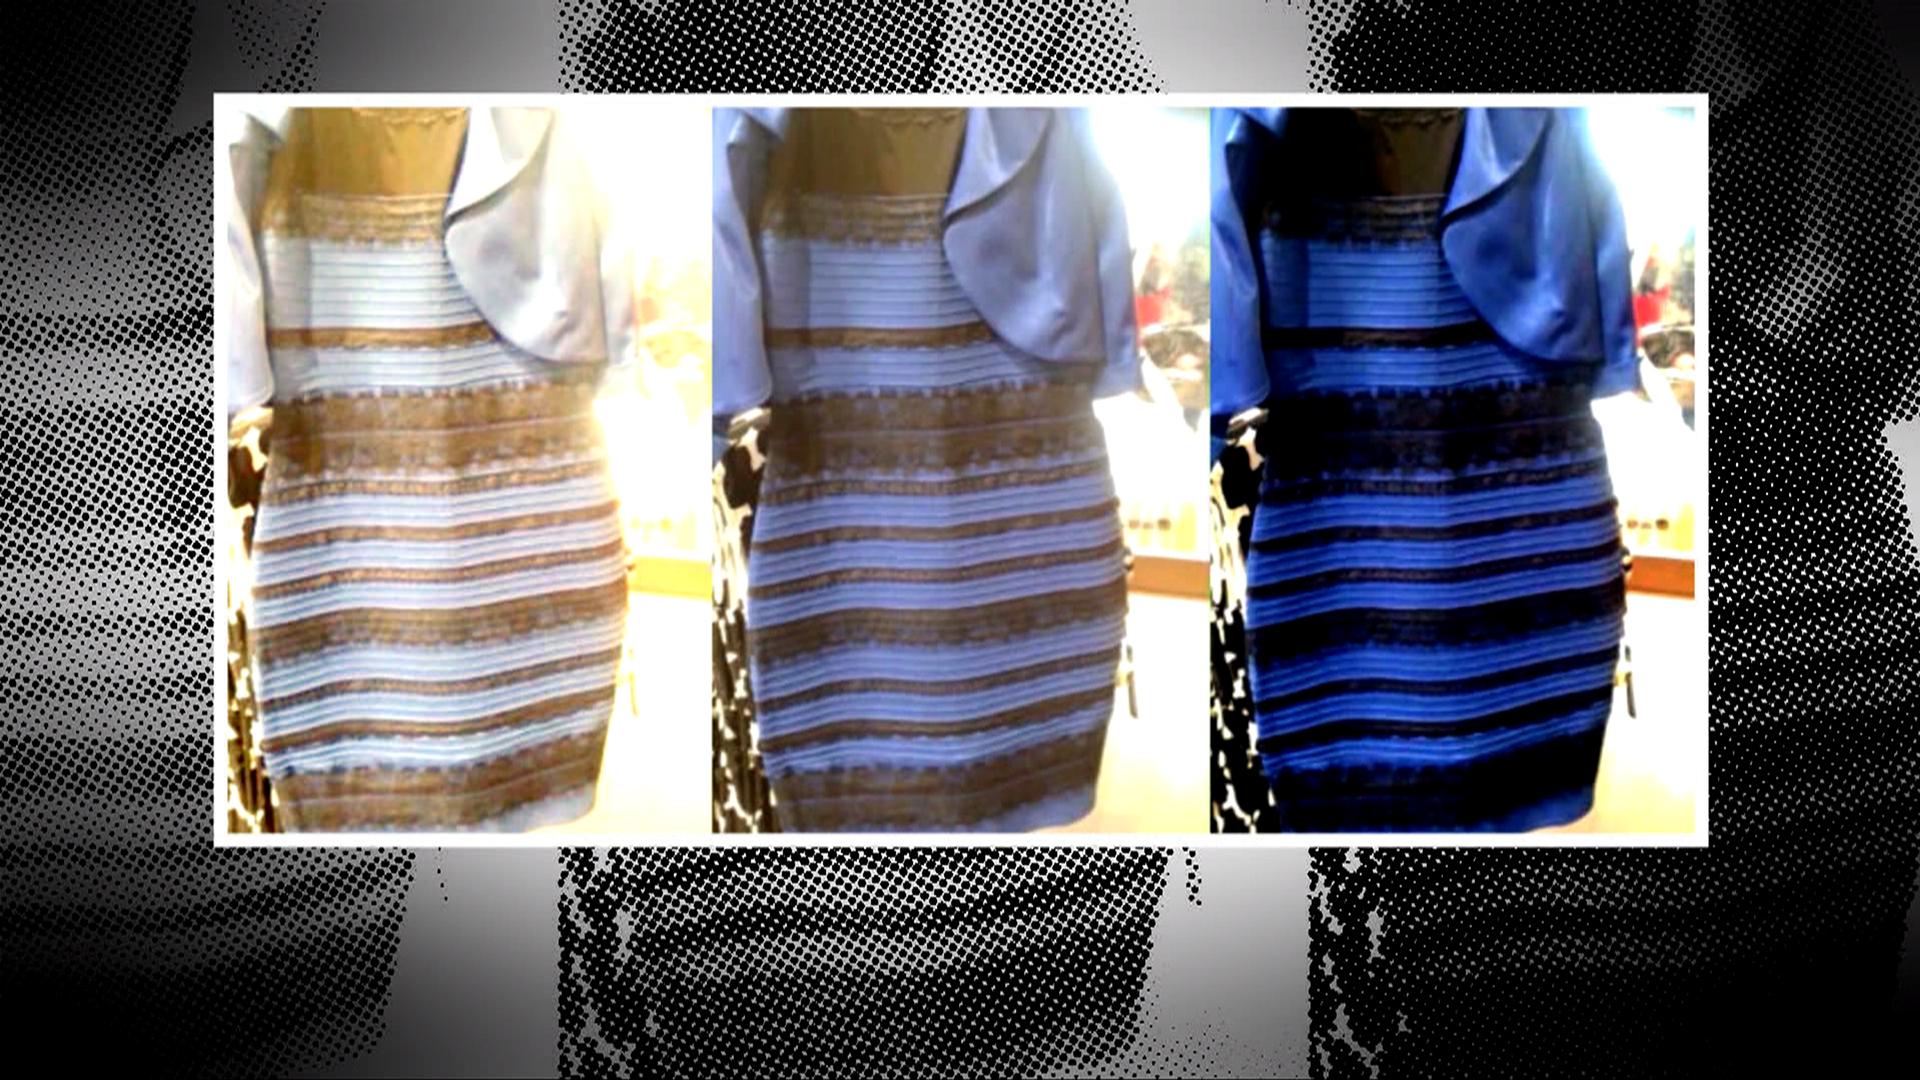 The dress debate color - The Dress Debate Color 48